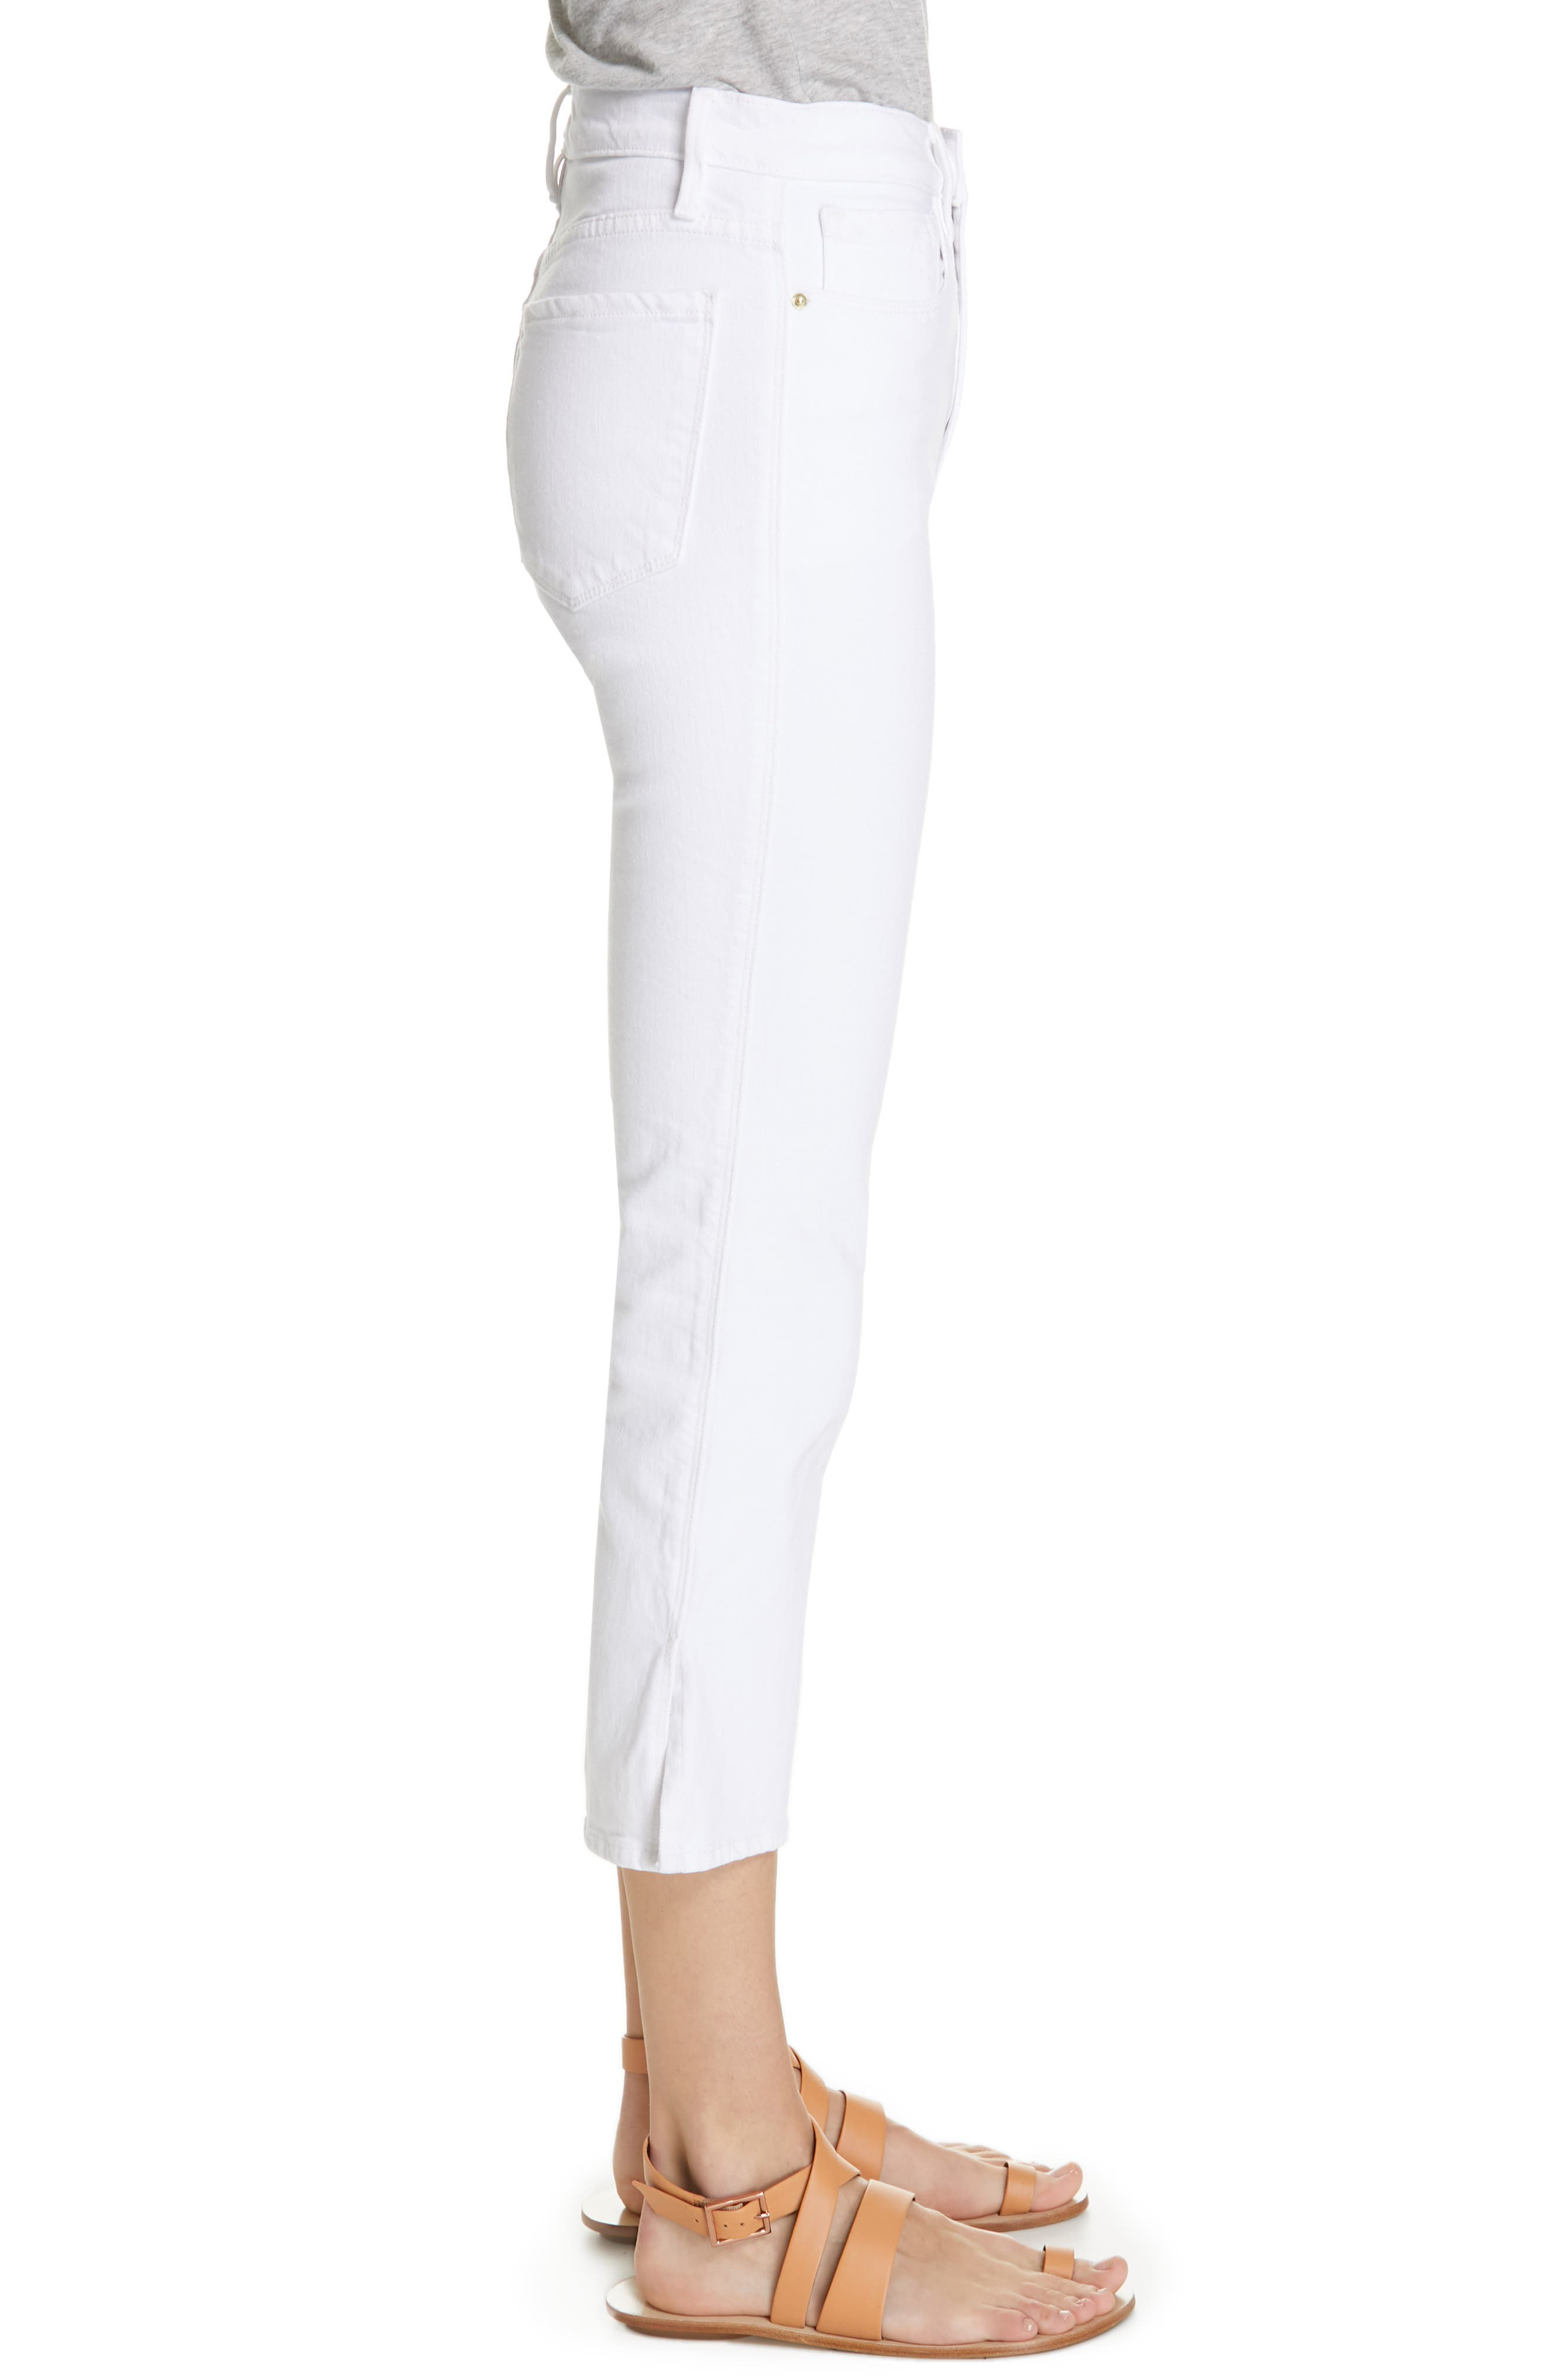 FRAME, Le Sylvie Slit Hem Ankle Slim Jeans, Alternate thumbnail 3, color, 100